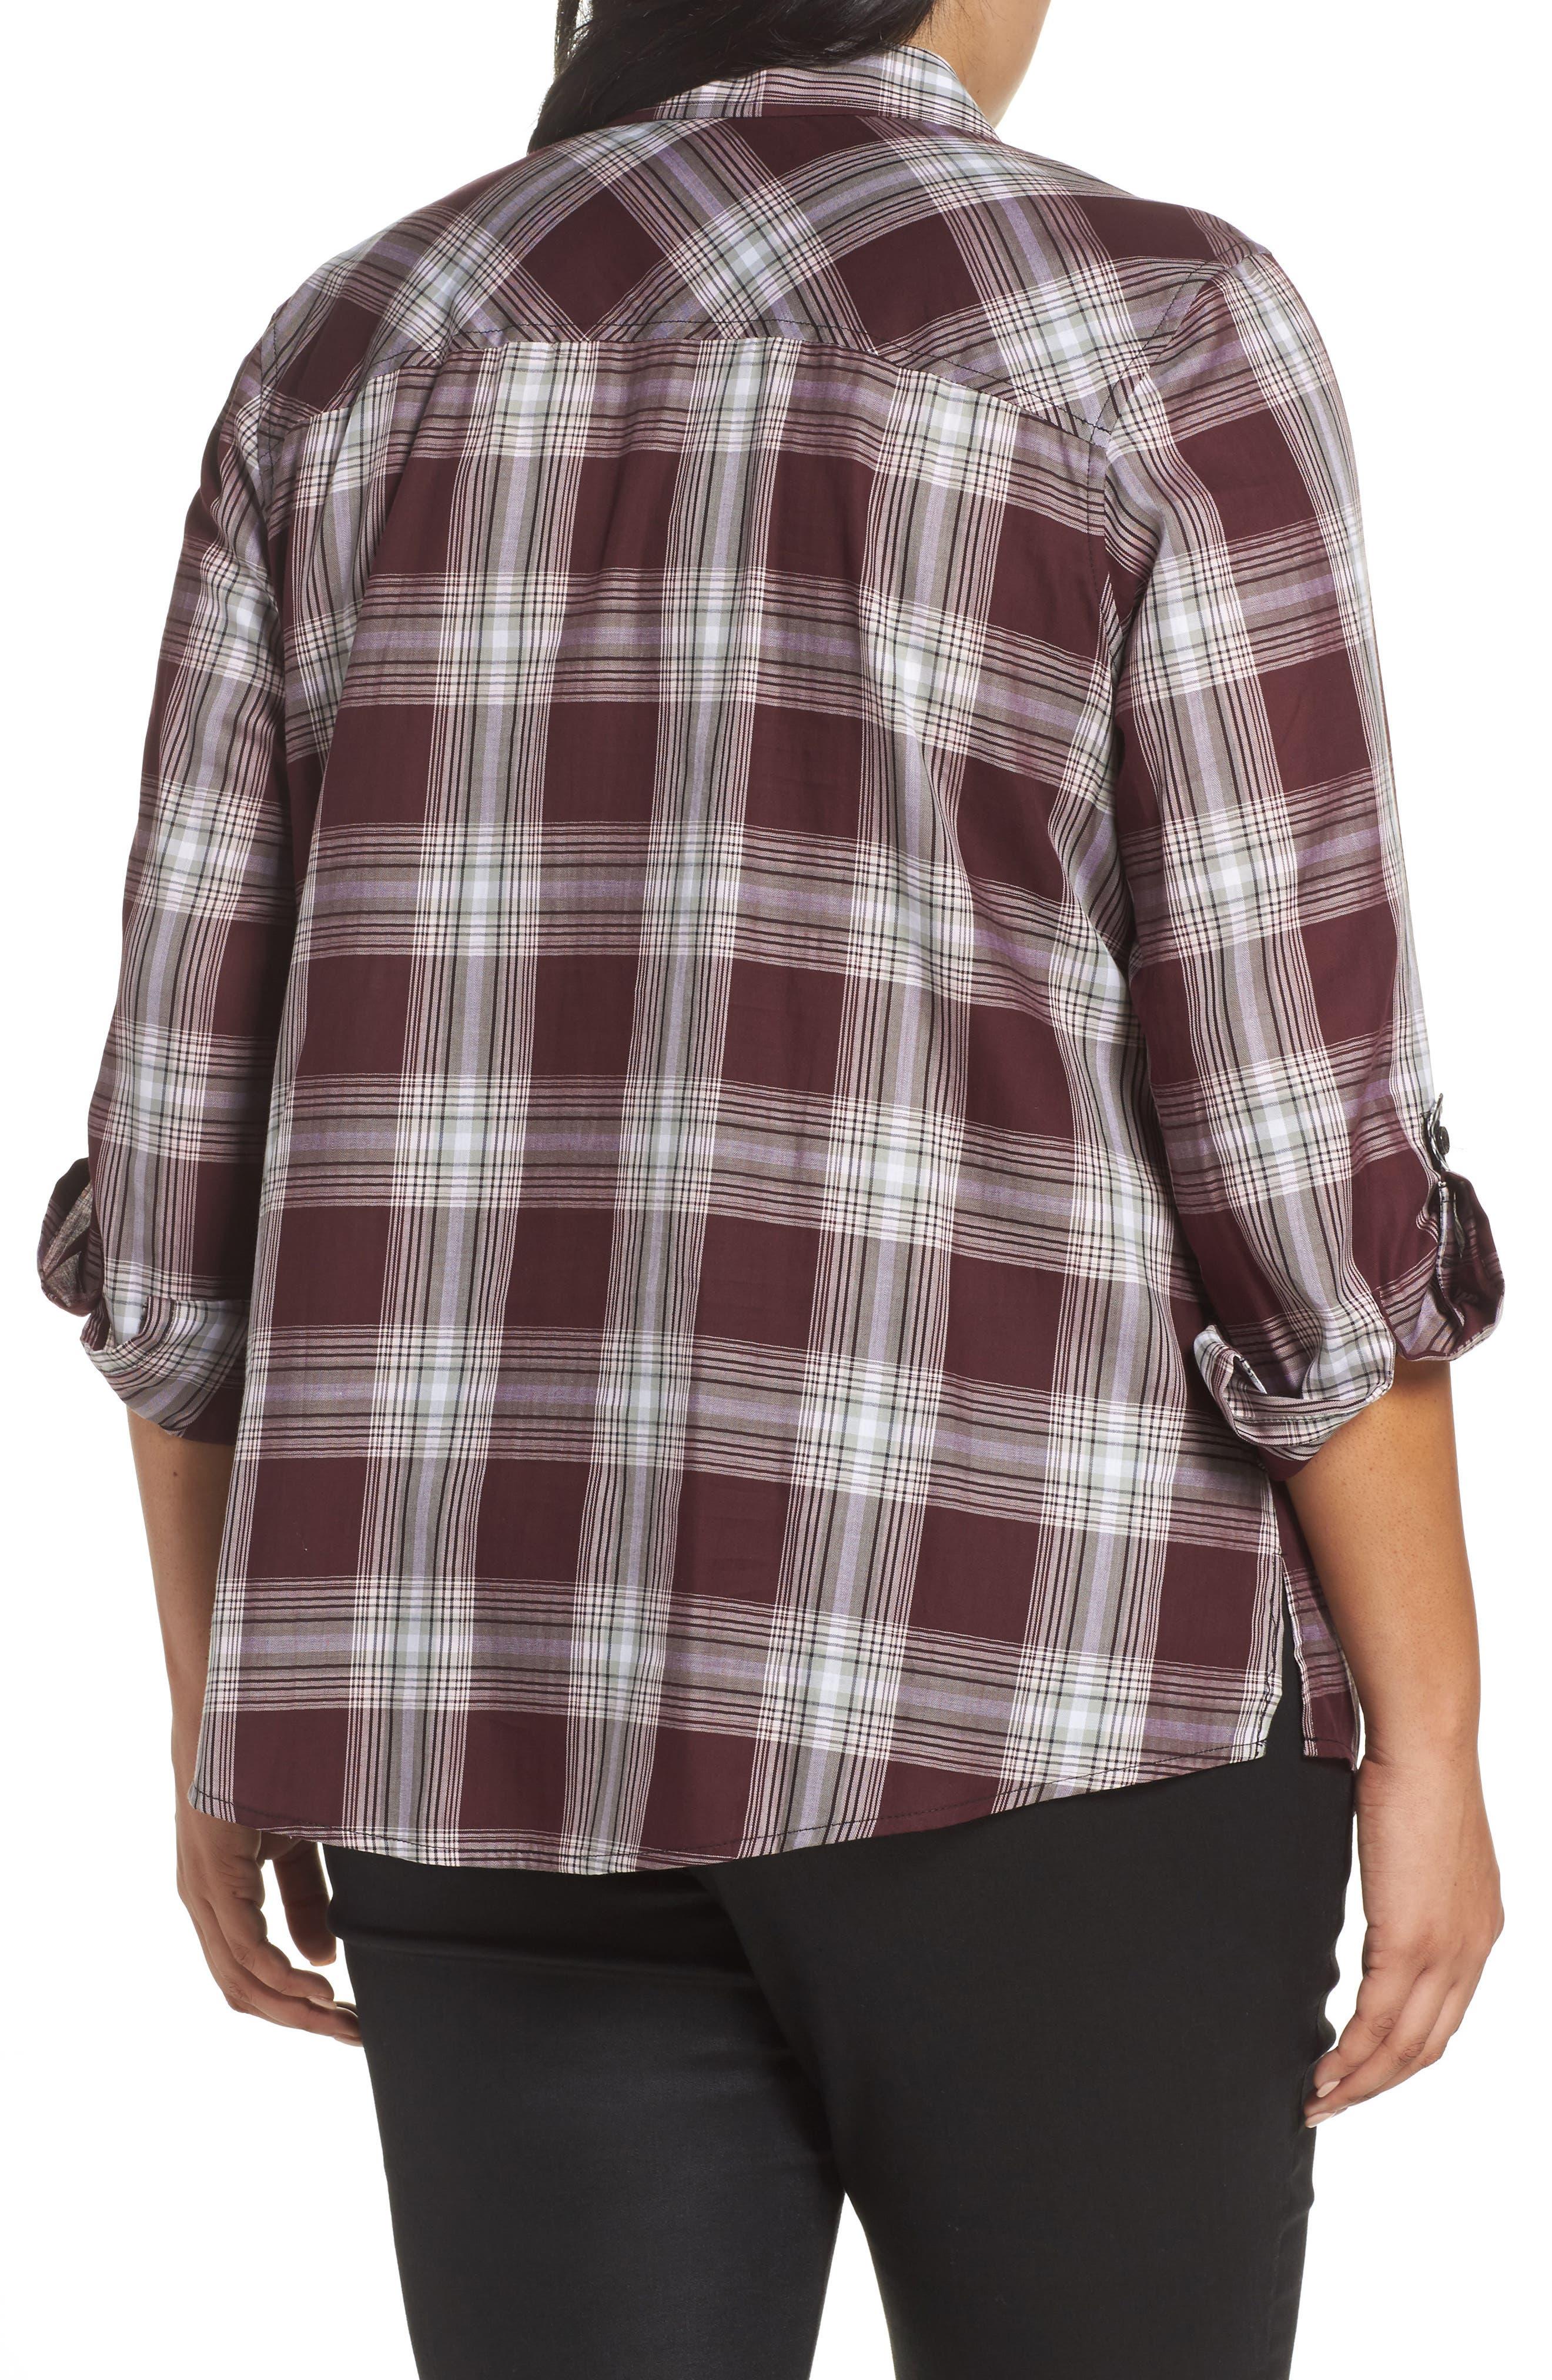 Alternate Image 2  - Foxcroft Addison Plaid Cotton Shirt (Plus Size)